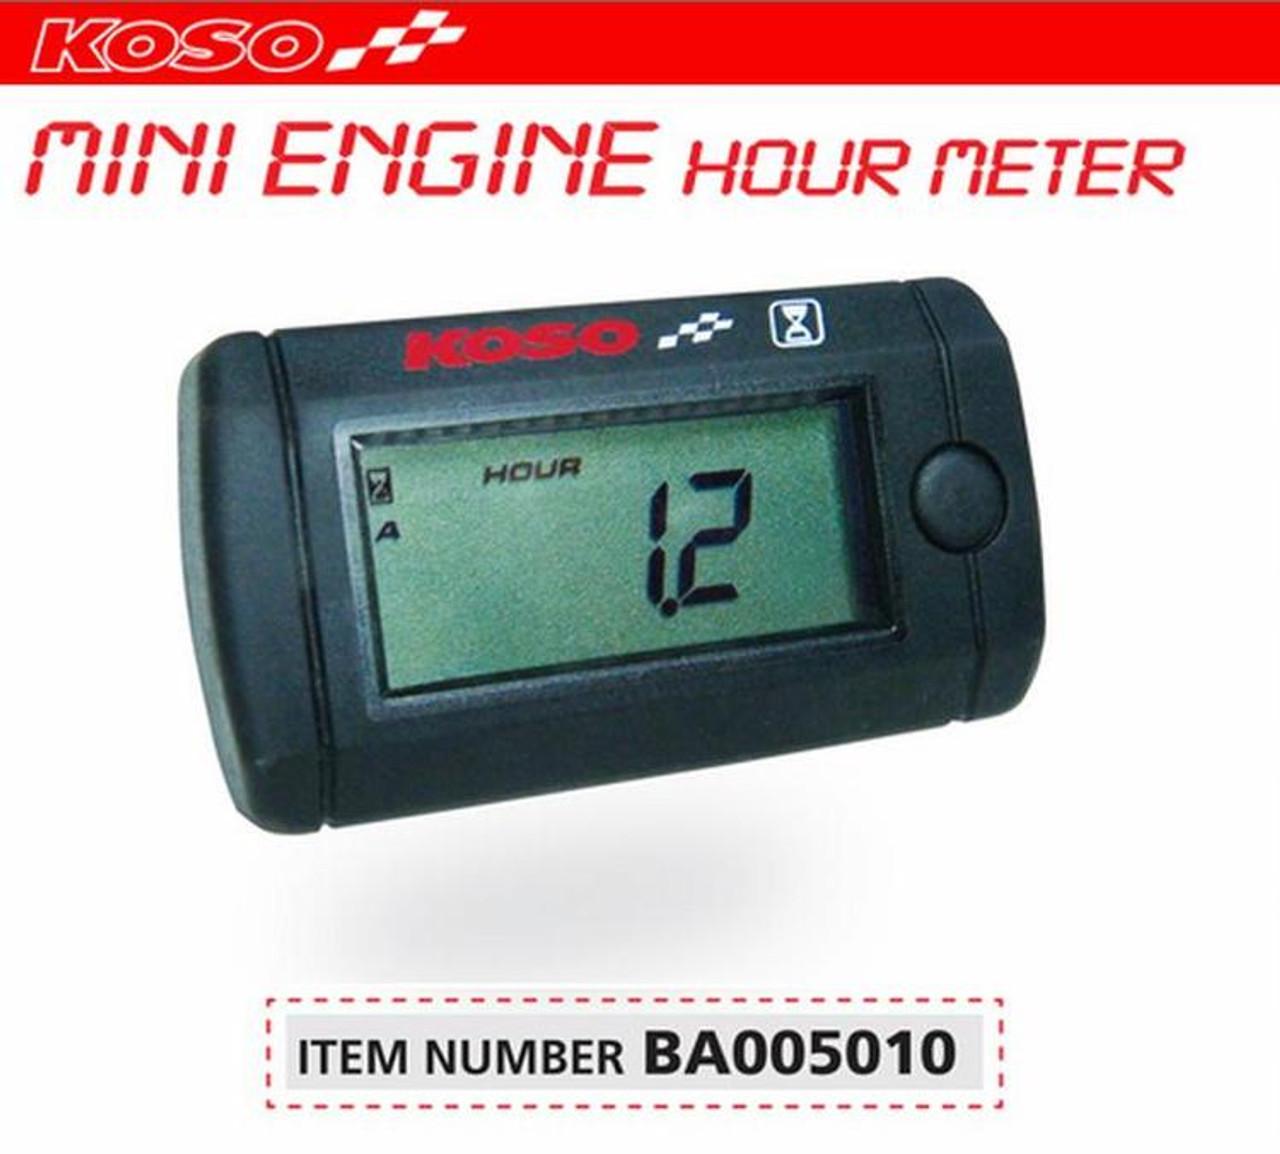 KOSO HOUR METER BA005010